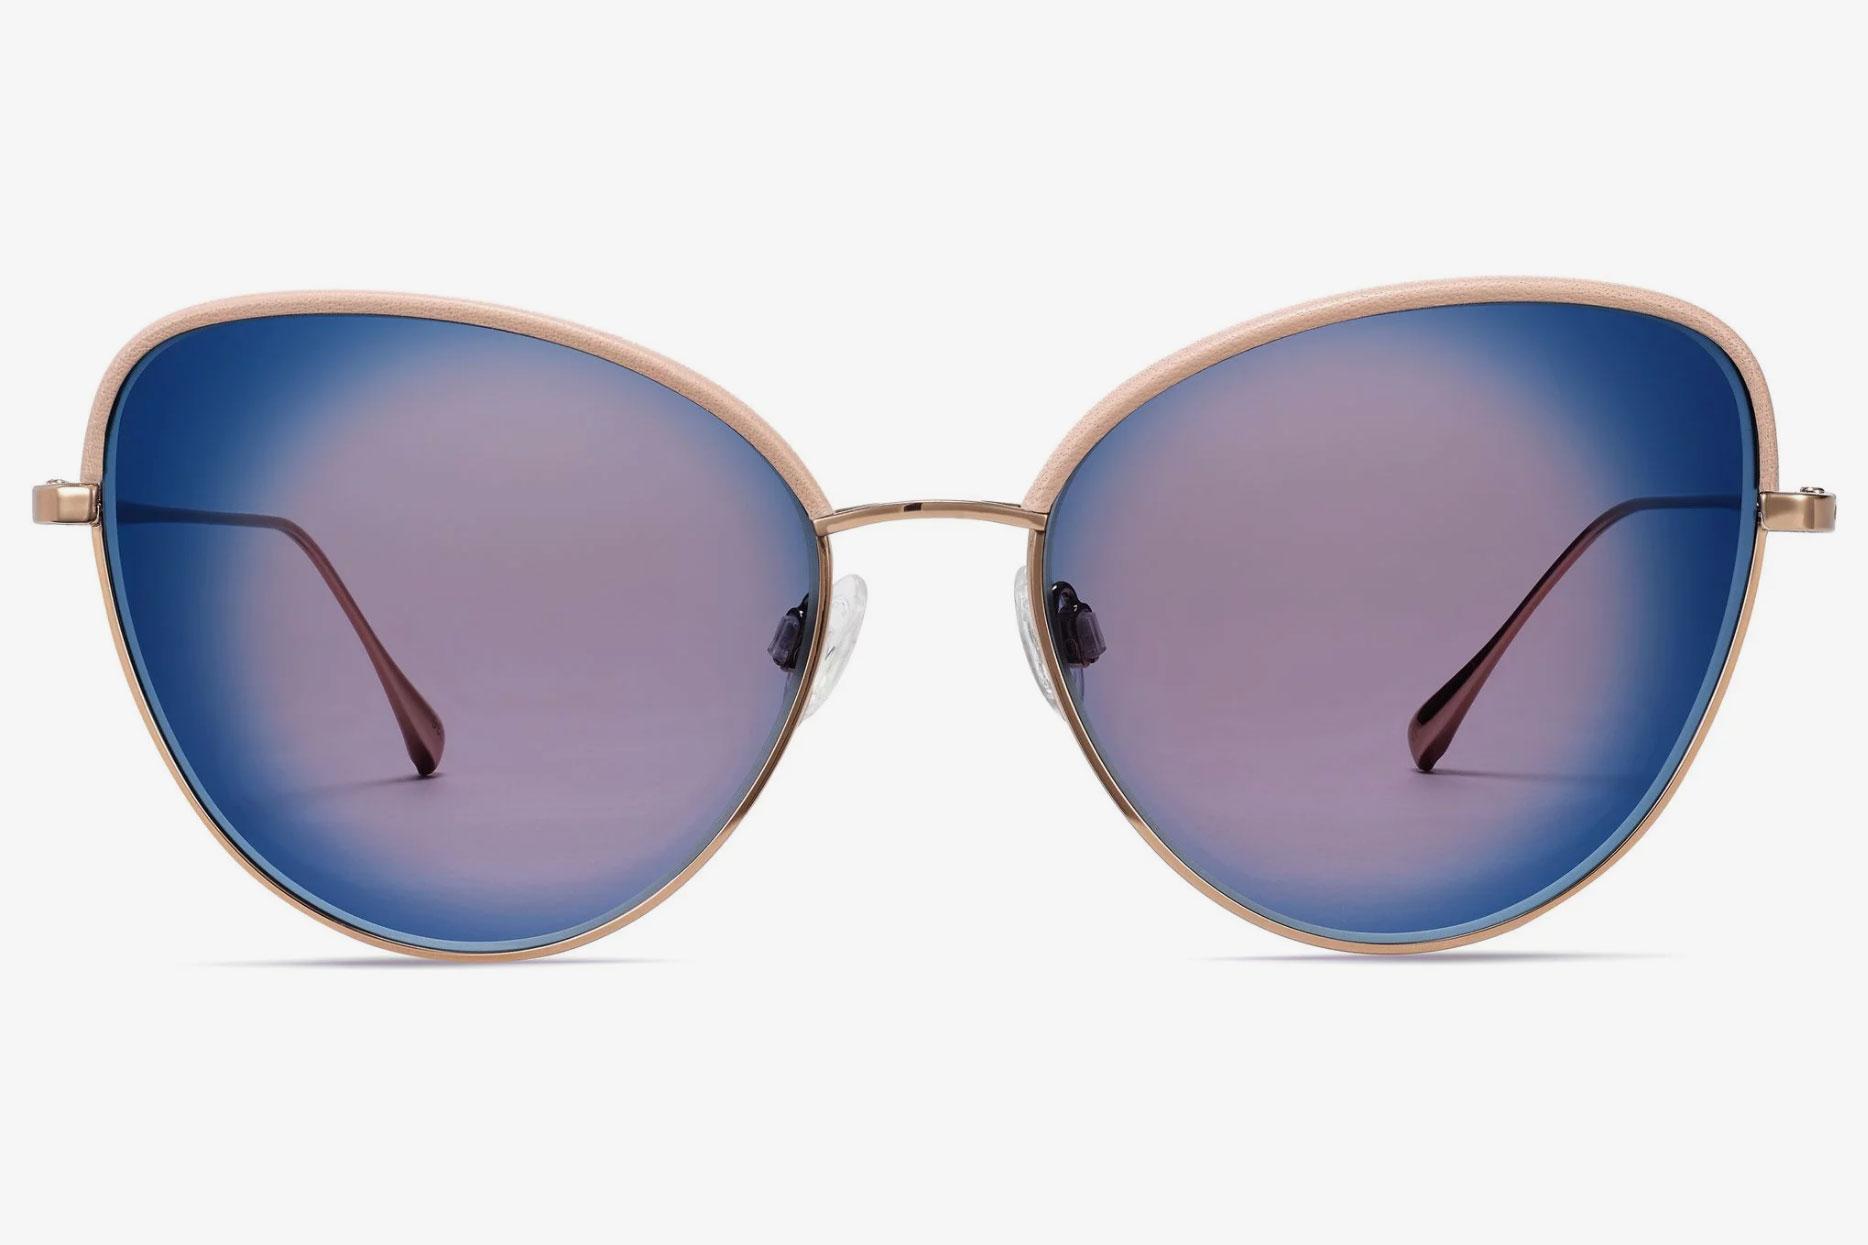 Warby Parker Nadine Sunglasses